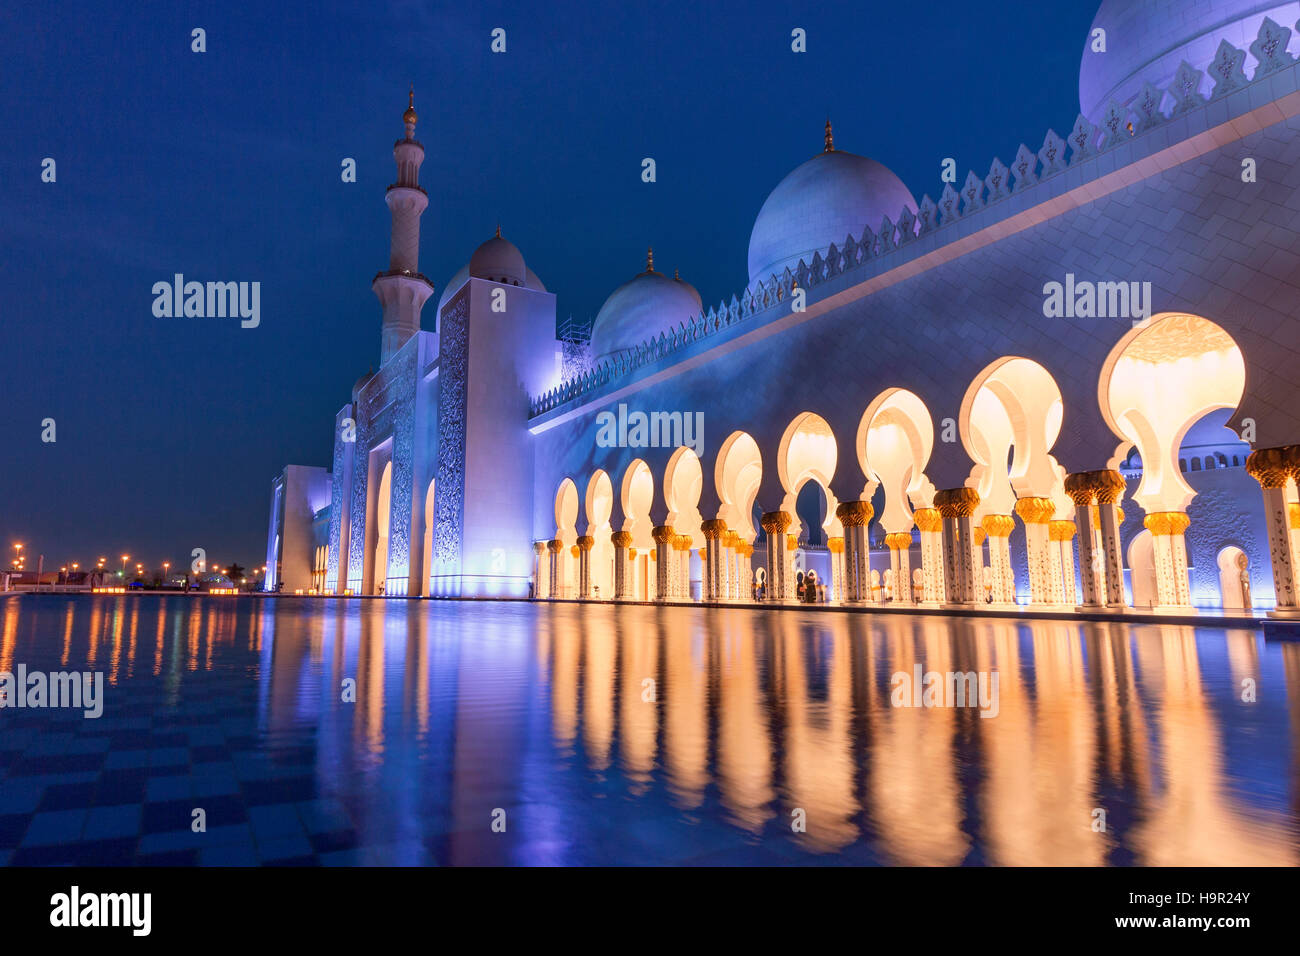 El agua delante de la Gran Mezquita de Sheikh Zayed, Abu Dhabi, Emiratos Árabes Unidos, EAU Imagen De Stock